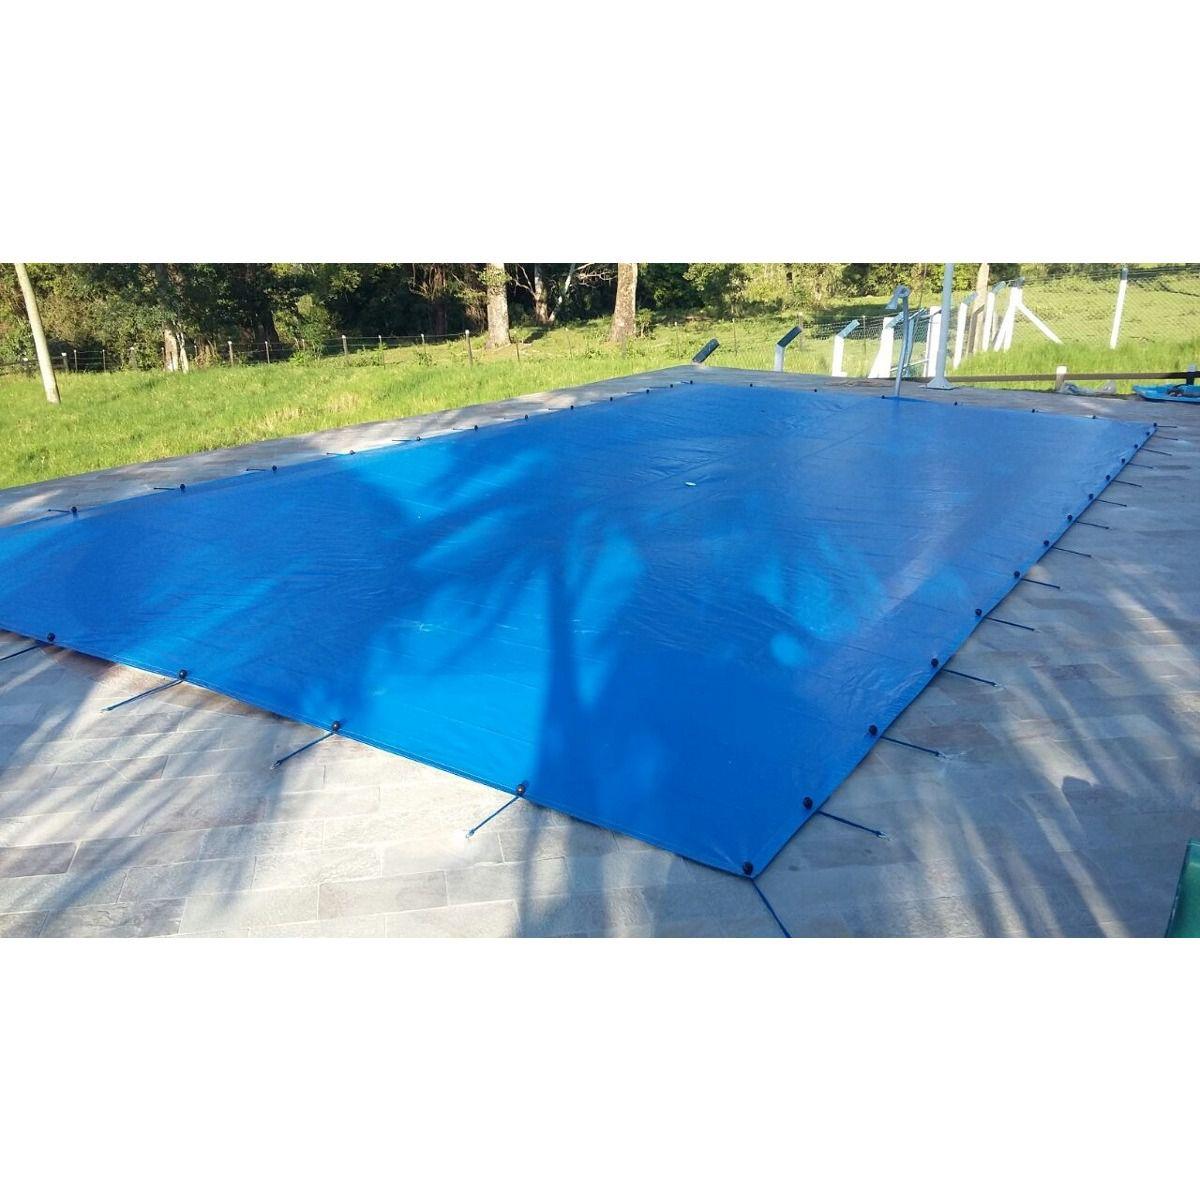 Lona Polietileno Azul 300 Micras - 8,5x3,5